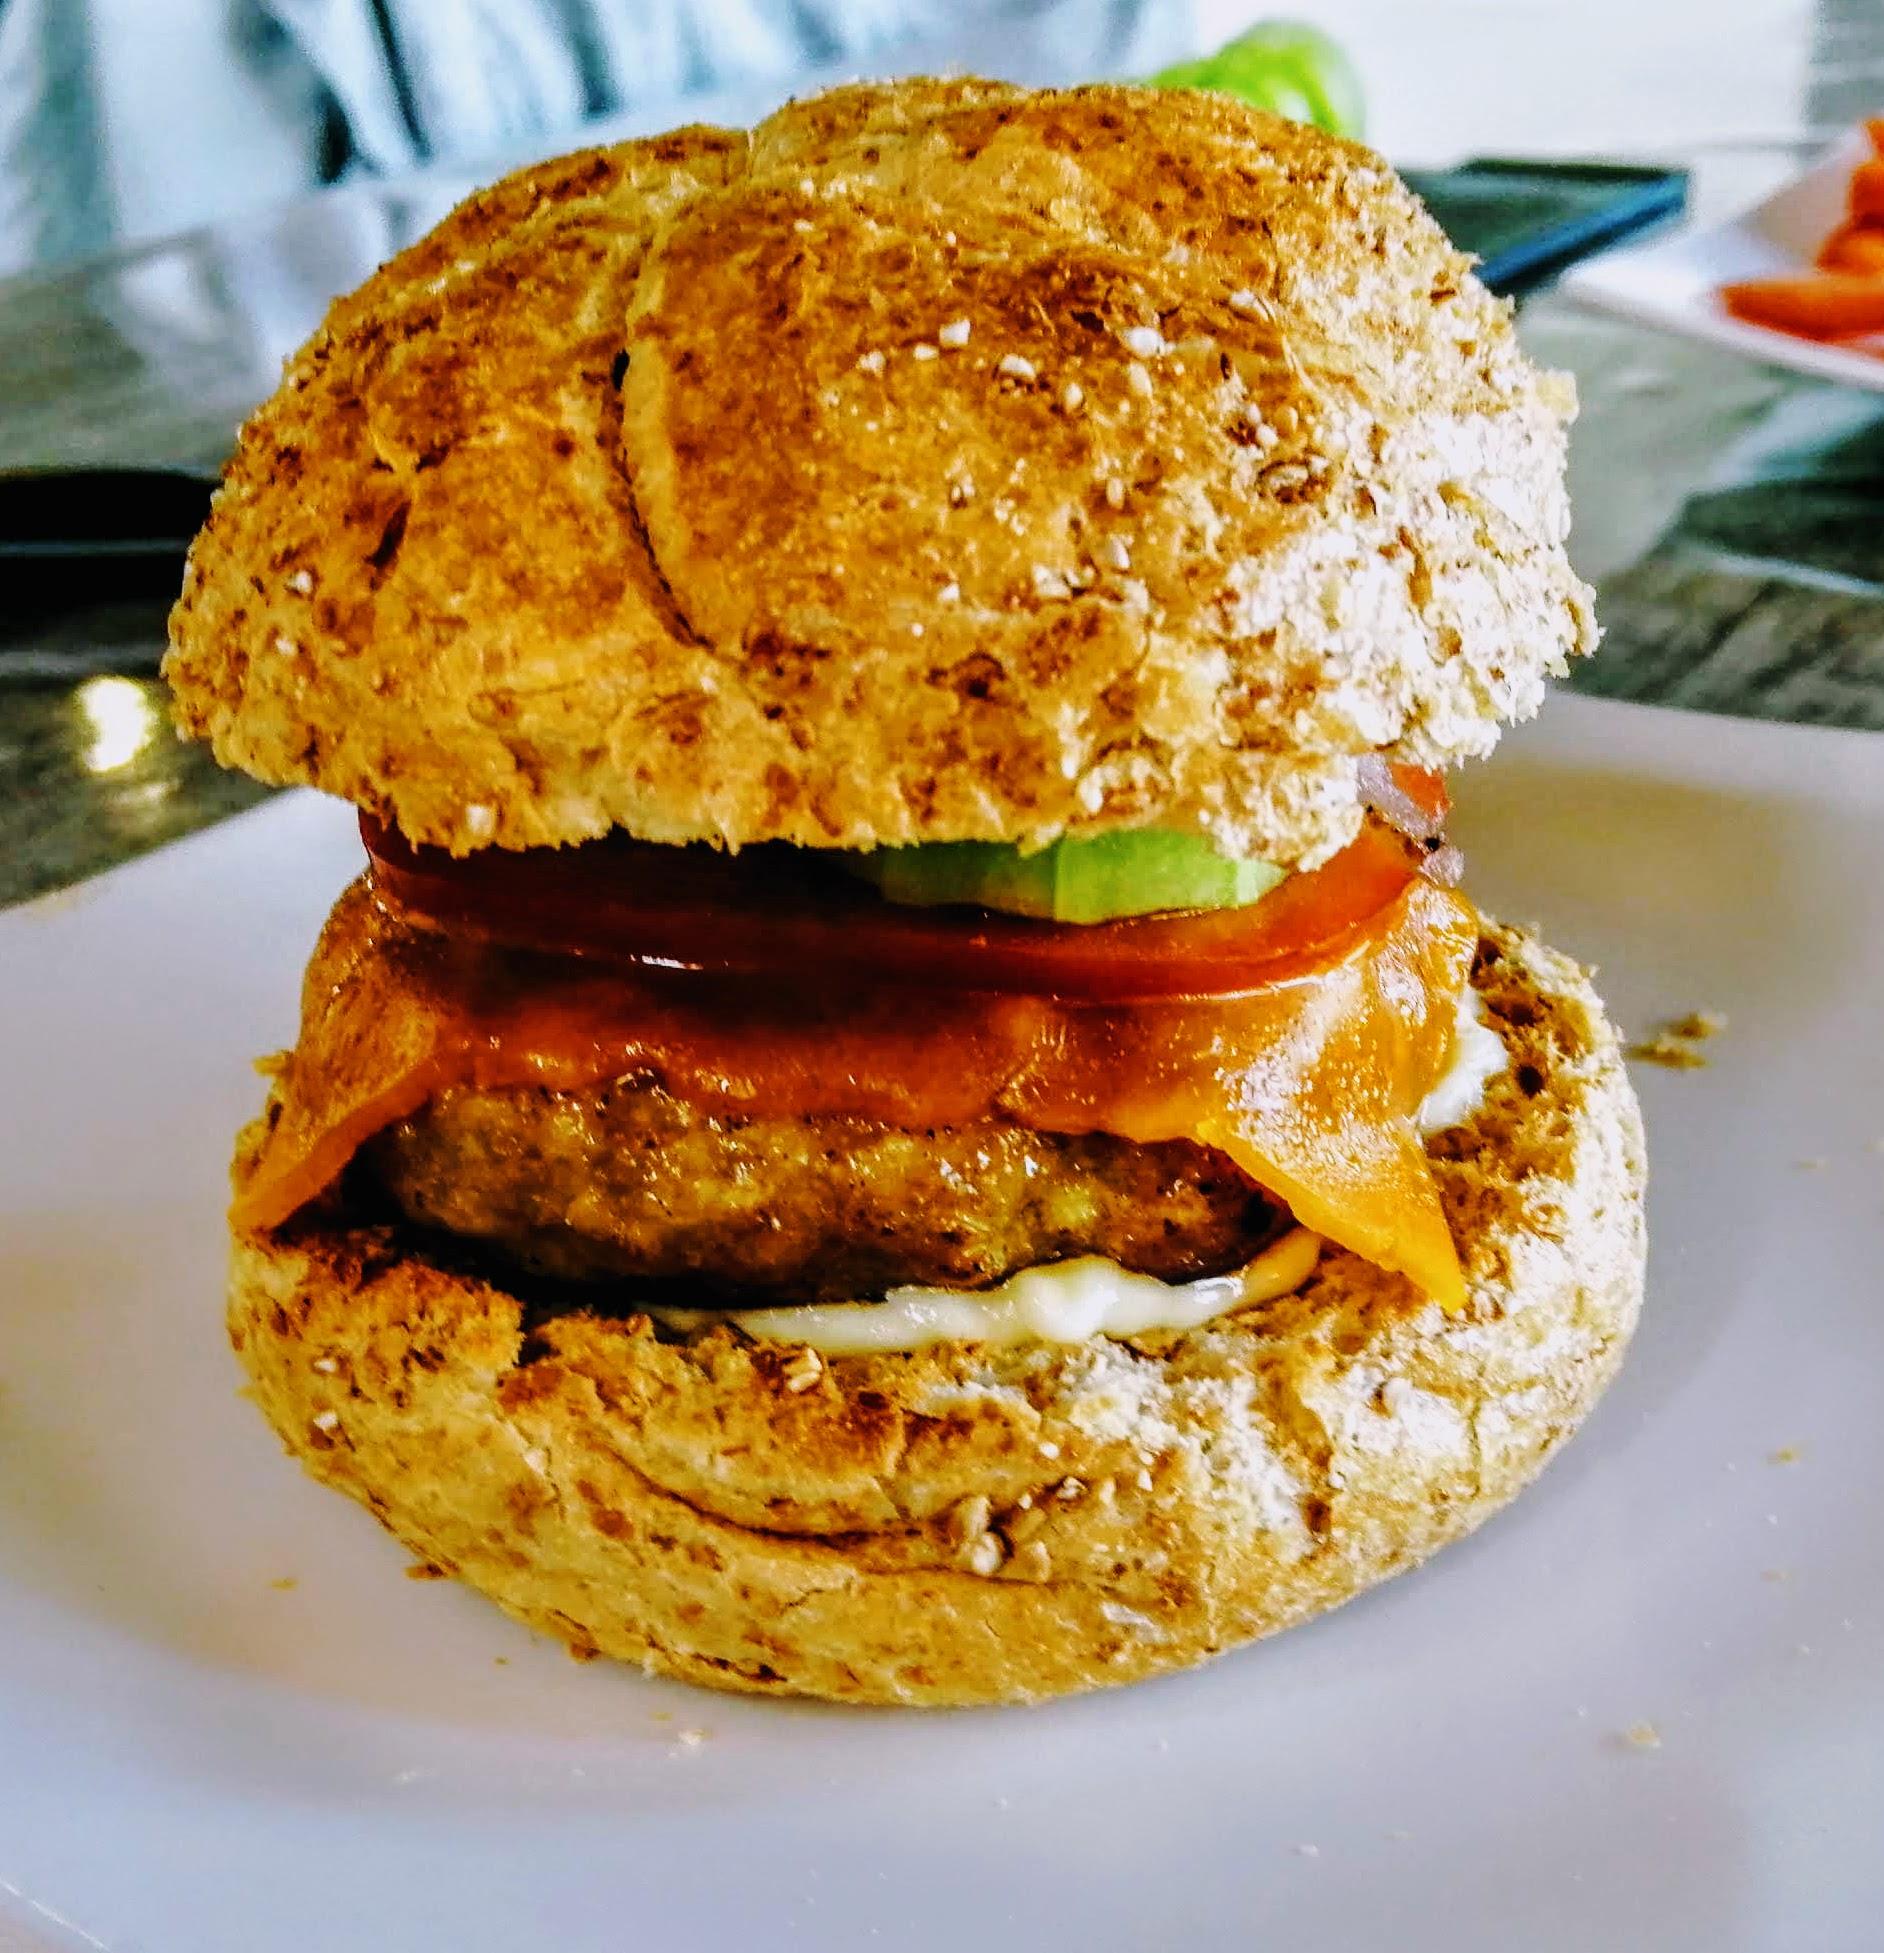 Hamburger faible en calorie